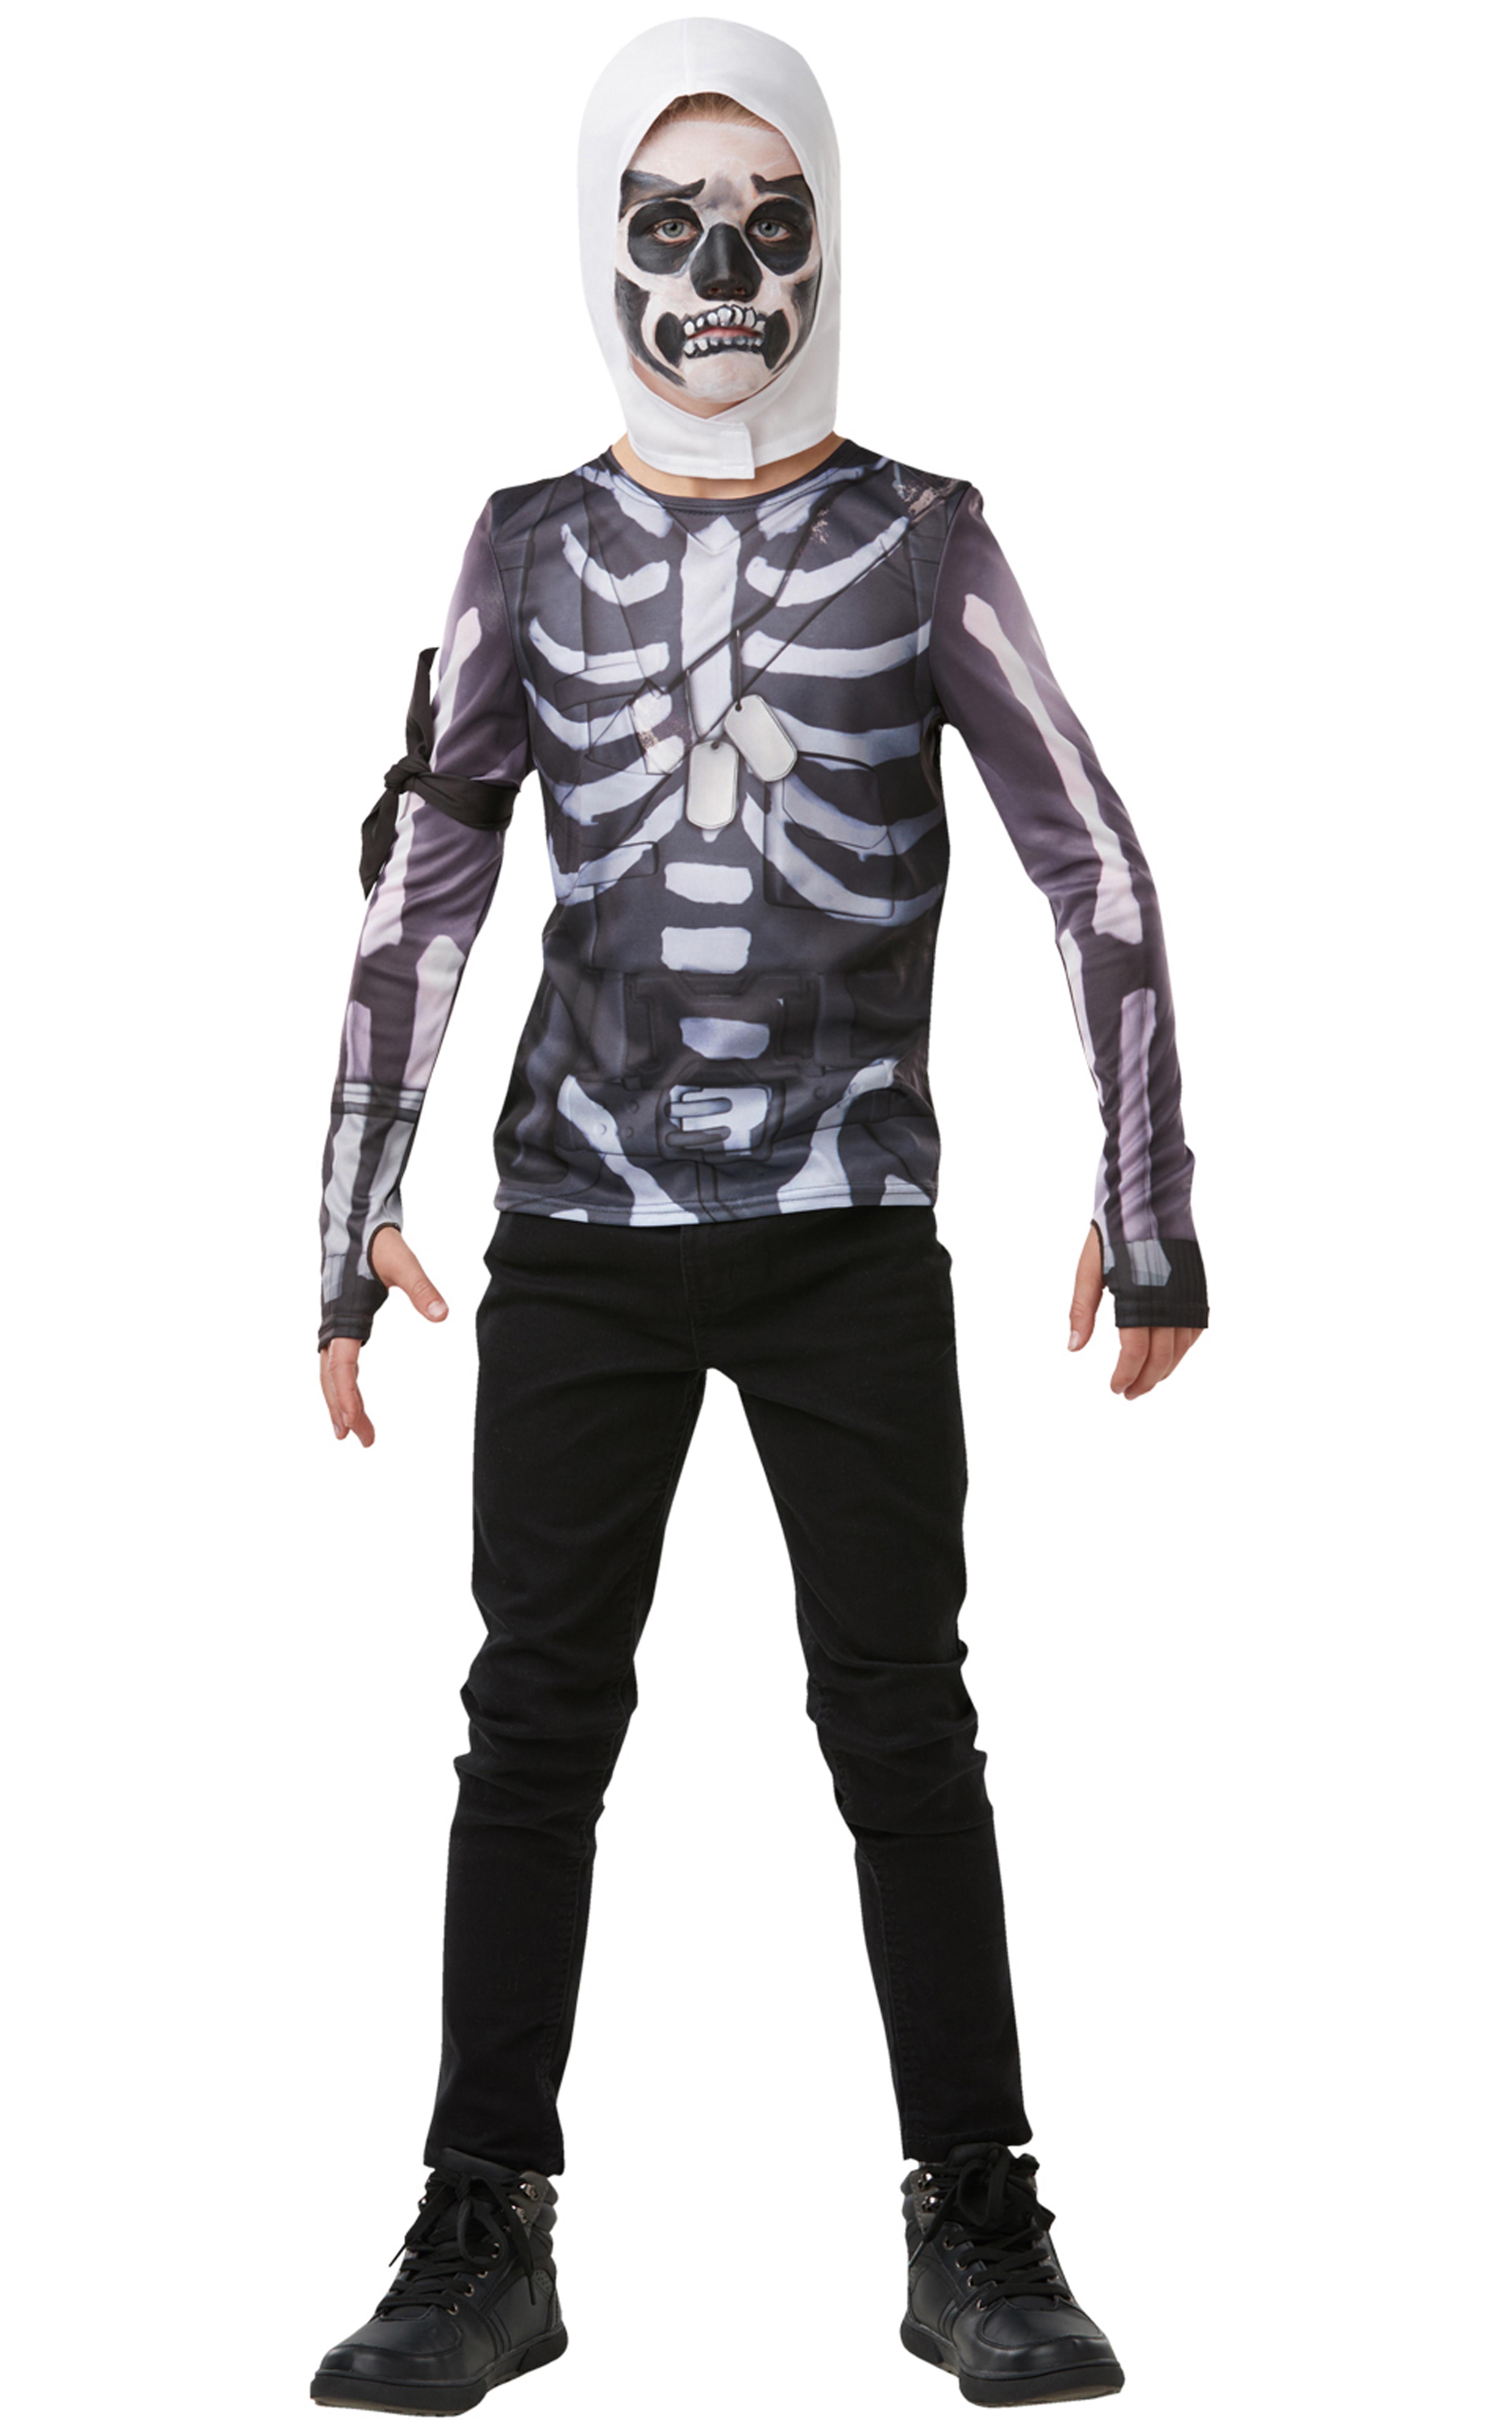 Fortnite - Skull Trooper - Size 9-10 years (R-300208)